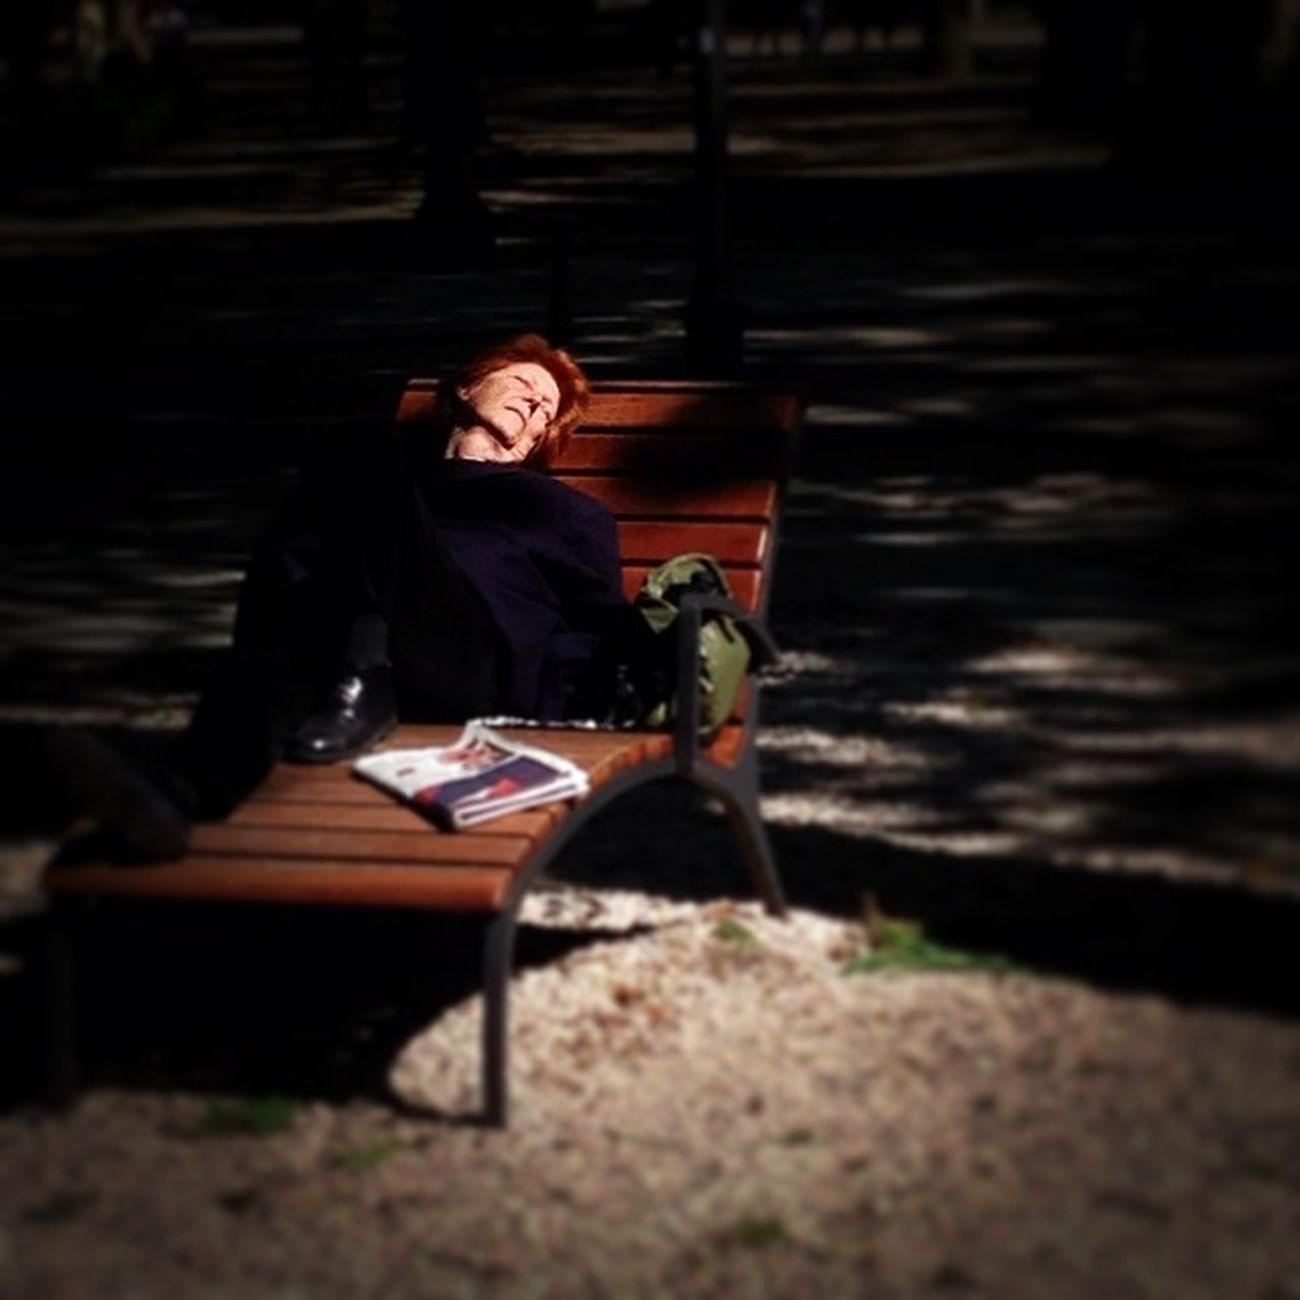 Riposo #fe2014 #fotografiaeuropea2014 #reggioemilia #lifeisbeautiful #sunshines #webstapick #instalife #meshpics